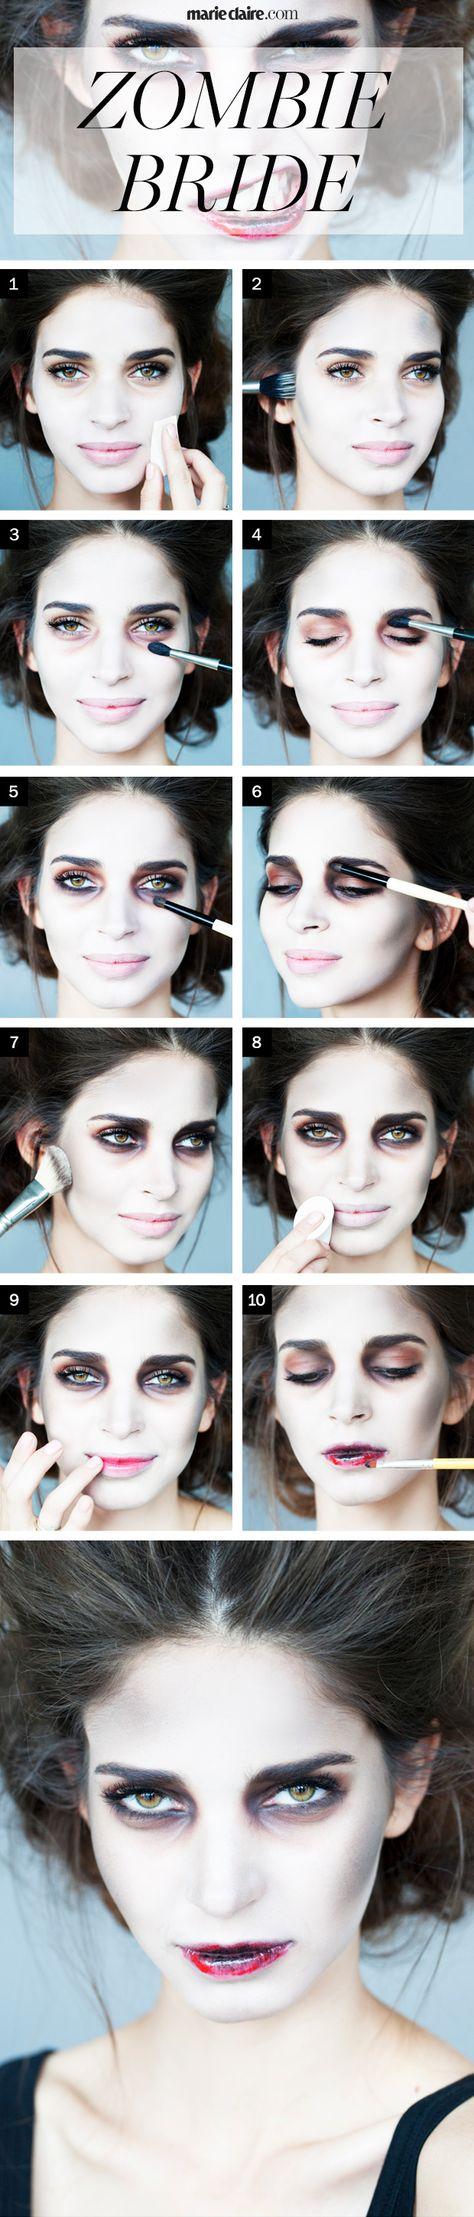 Easy fantasy makeup looks